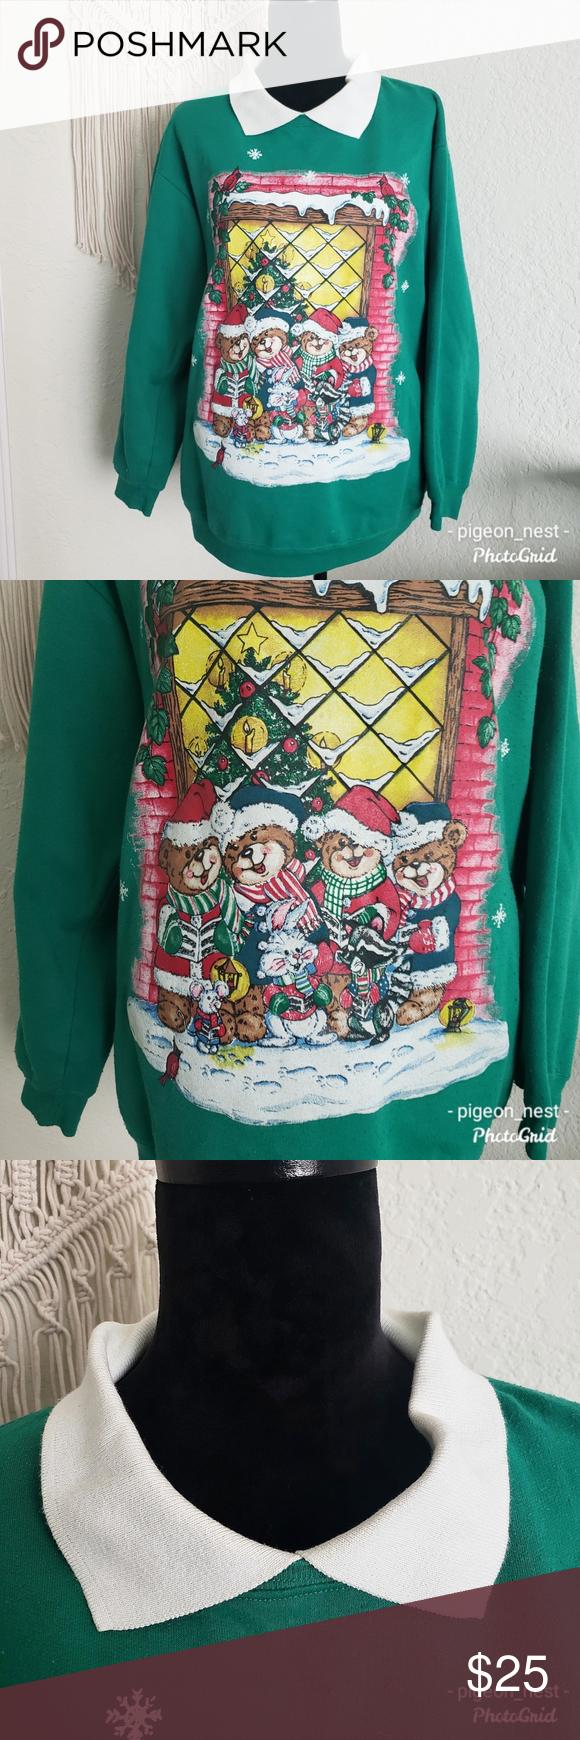 Holiday Caroling Animal Sweater Vintage 1X Vintage